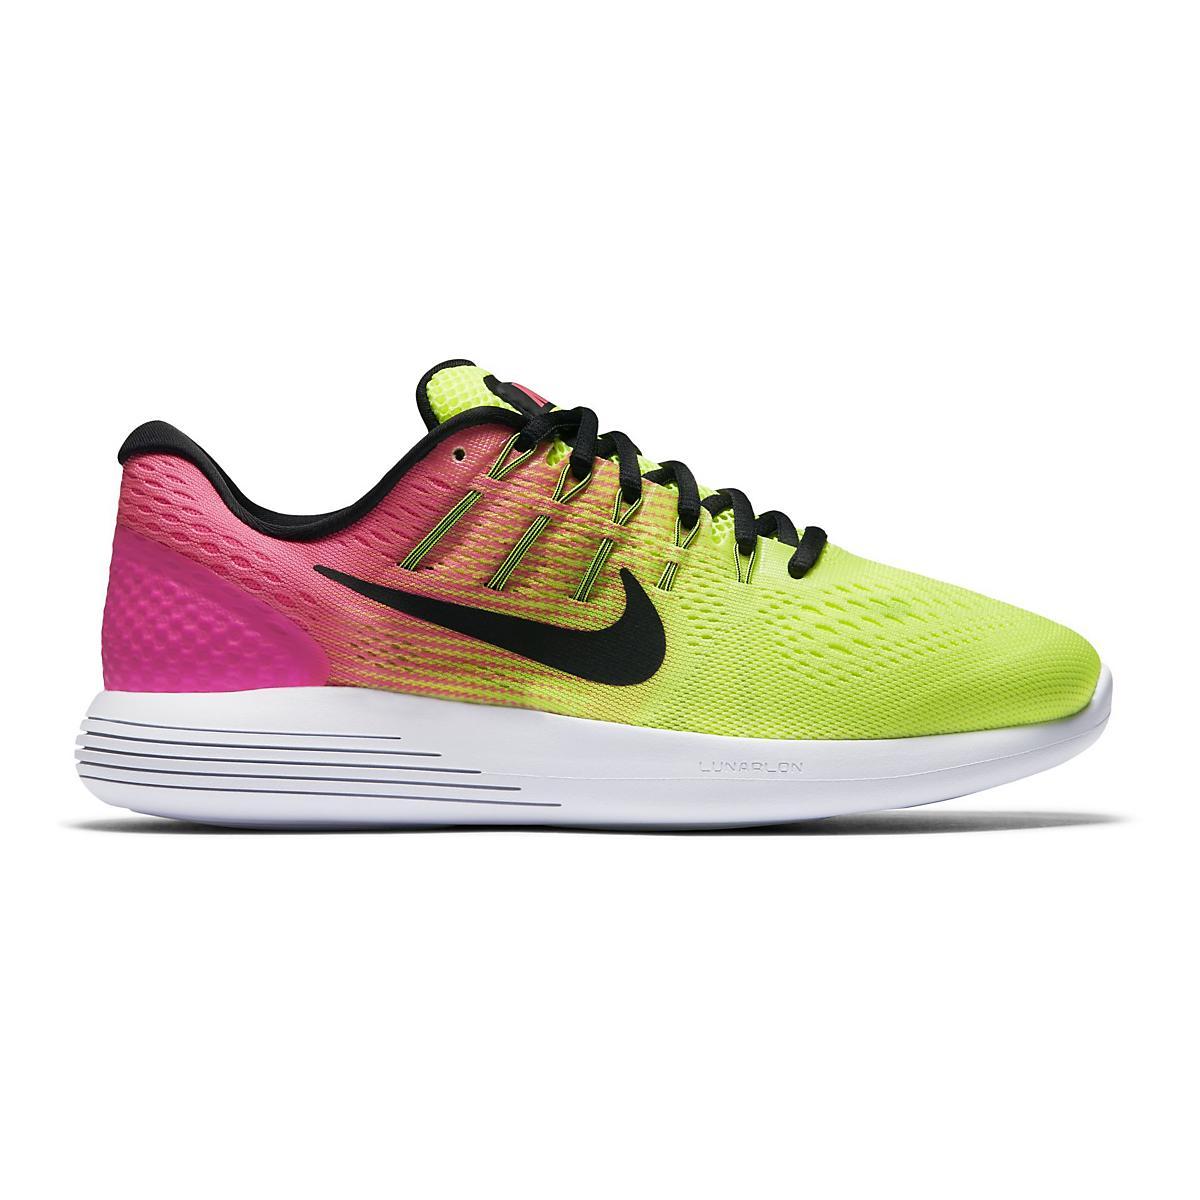 1455f13cb2ab8 Womens Nike LunarGlide 8 Summer Games Running Shoe at Road Runner Sports